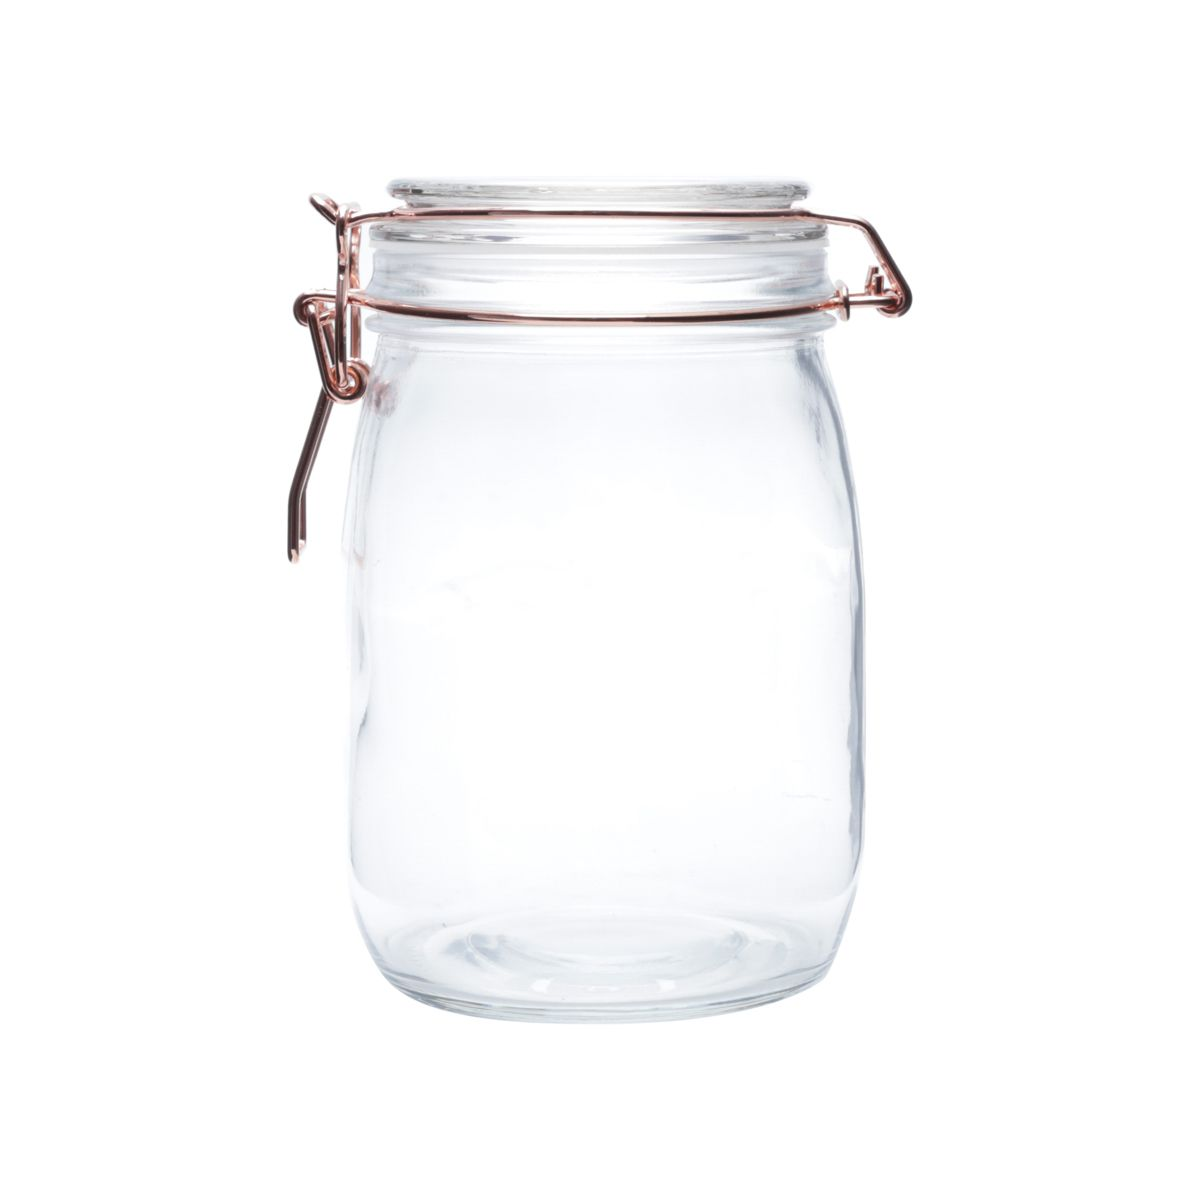 POTE VIDRO BOROSSILICATO HERMÉTICO COOPER GLASS FLIP BULGING COBRE GDE 10.5X10.5X17CM 1000ML - URBAN 40995